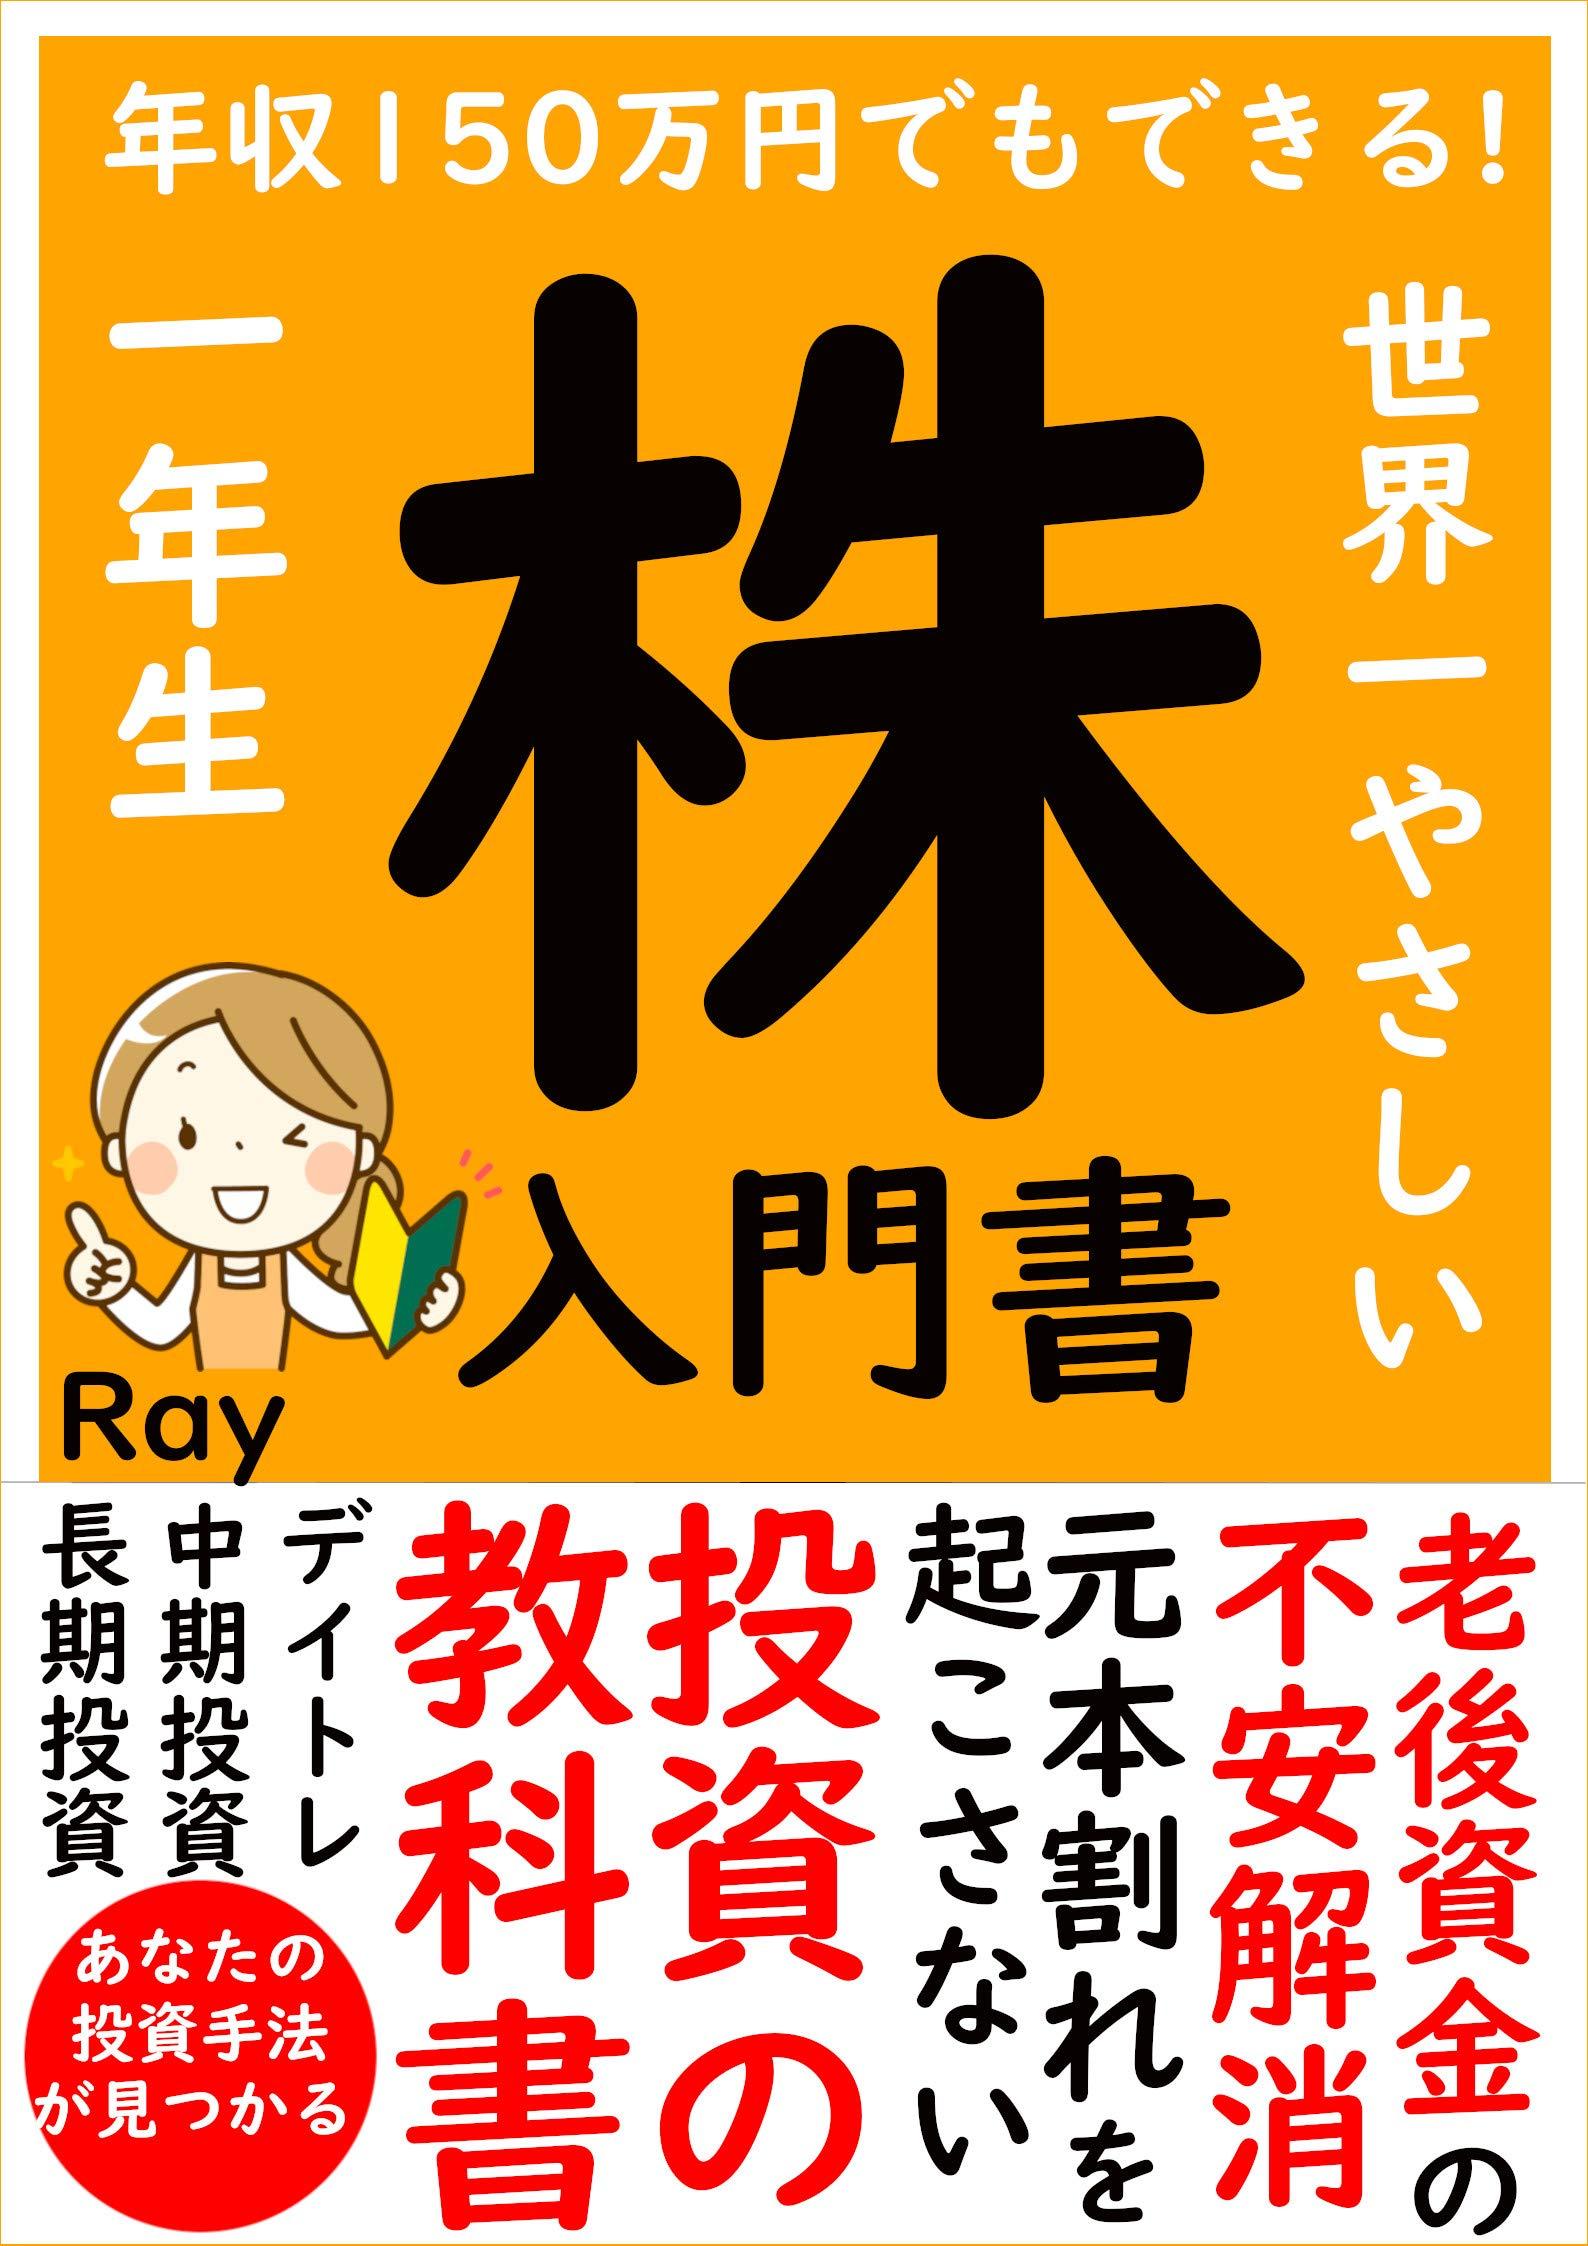 nenshuuhyakugpjyuumannendemodekiru sekaiitiyasasiikabunonyuumonnsho rougosikinnnohuanganakunarutousinokyoukasho kabusikitousi deitore-do hukugyou (Japanese Edition)